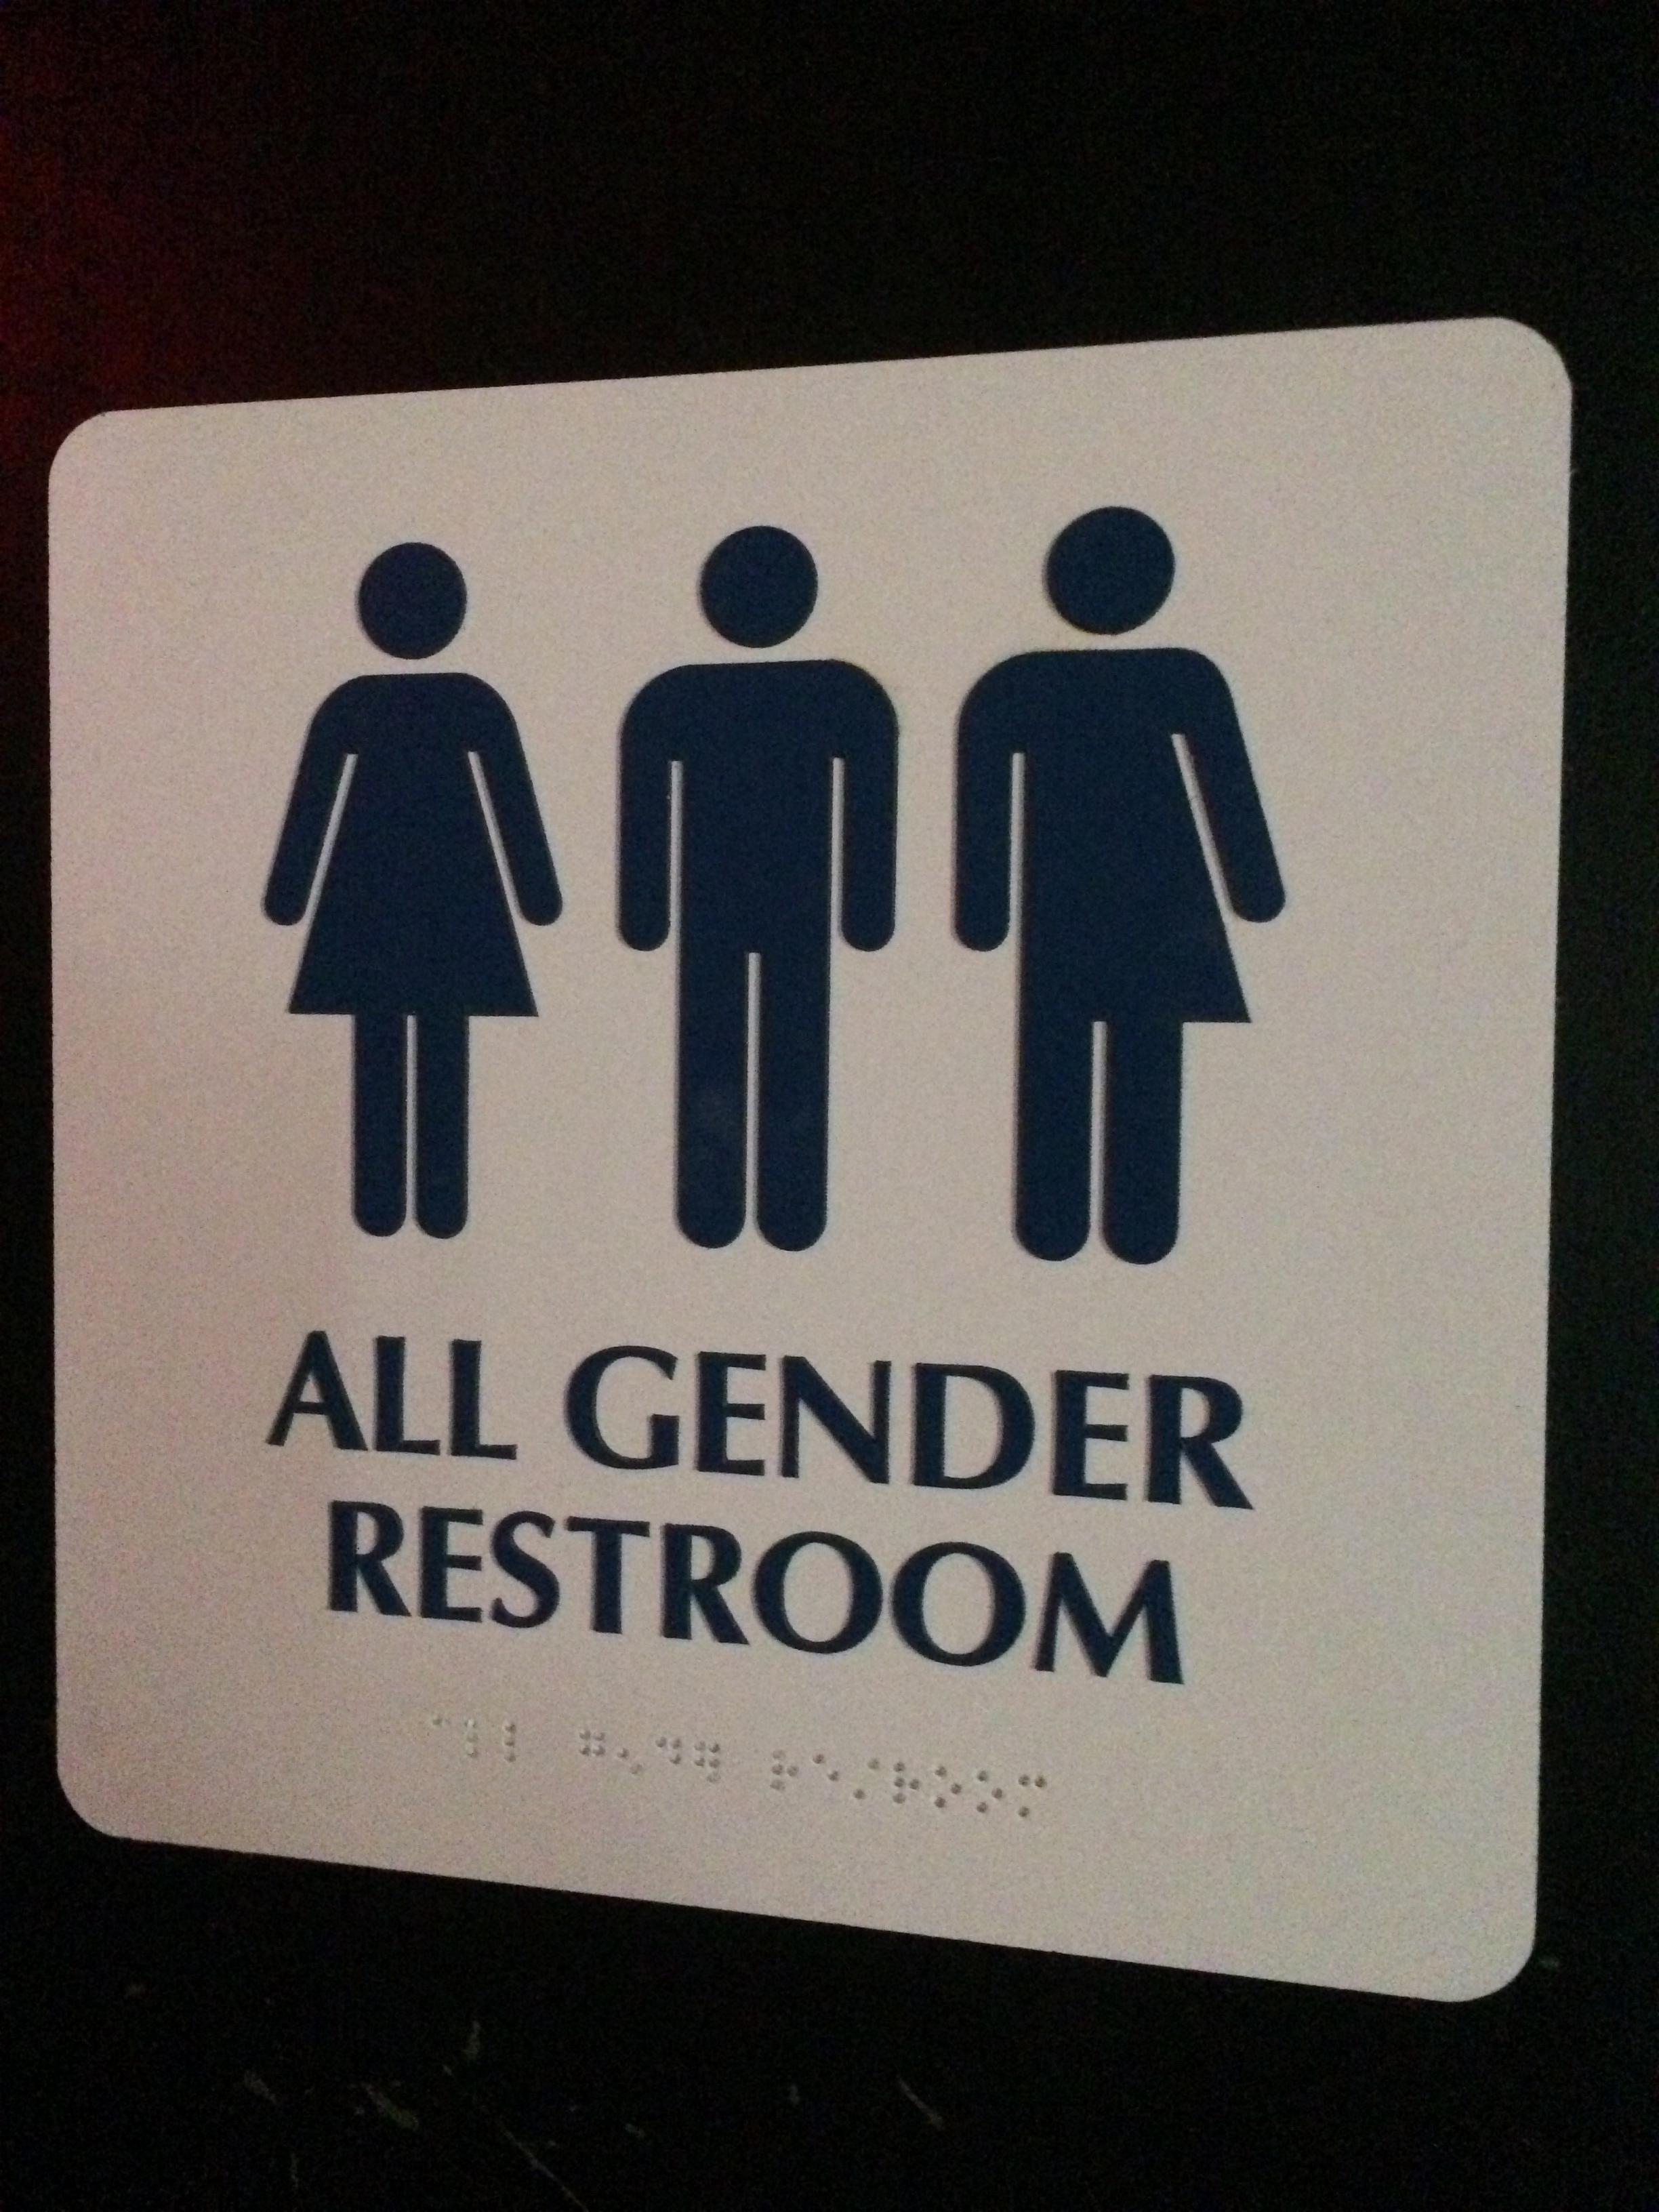 Catholic bishops slam Obamas disturbing transgender bathroom